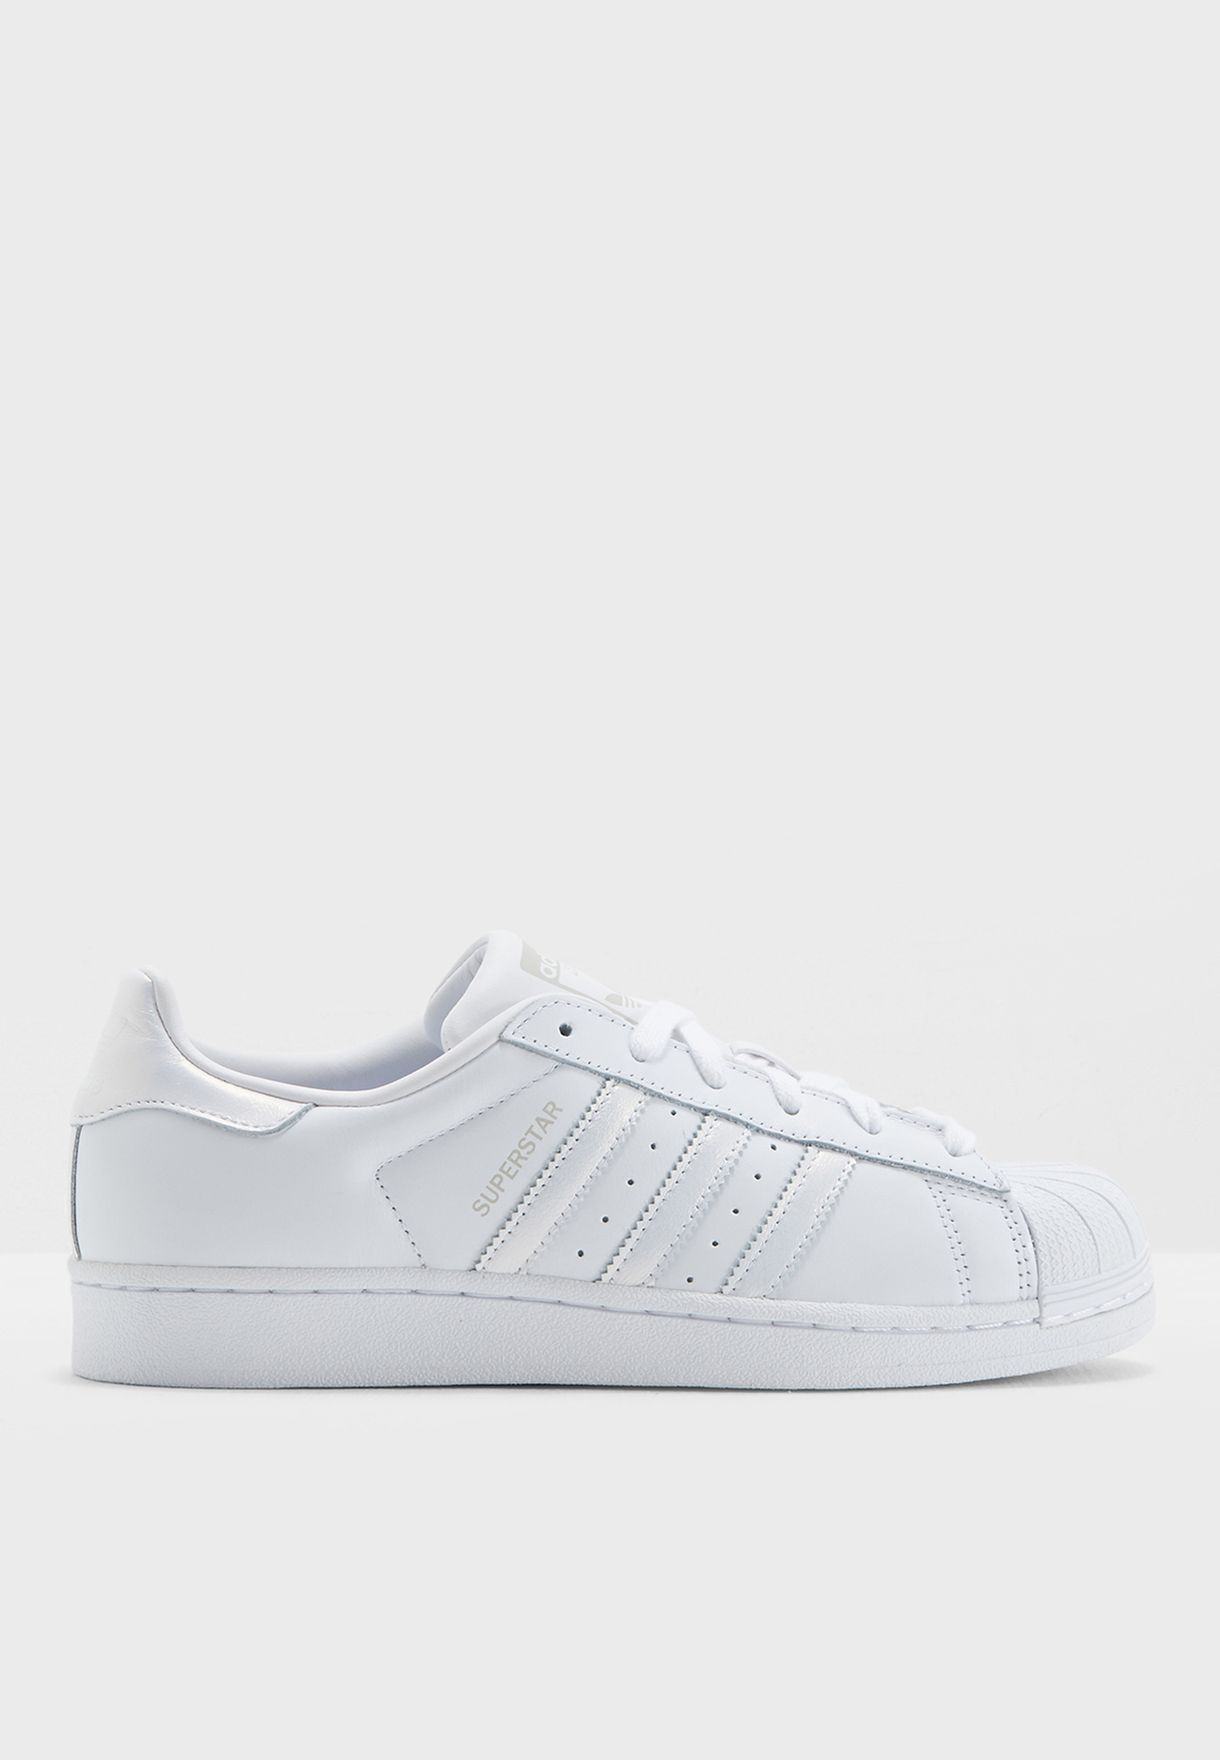 Women's Shoes Adidas Originals Superstar W White Grey Women Casual Shoes Sneakers Aq1214